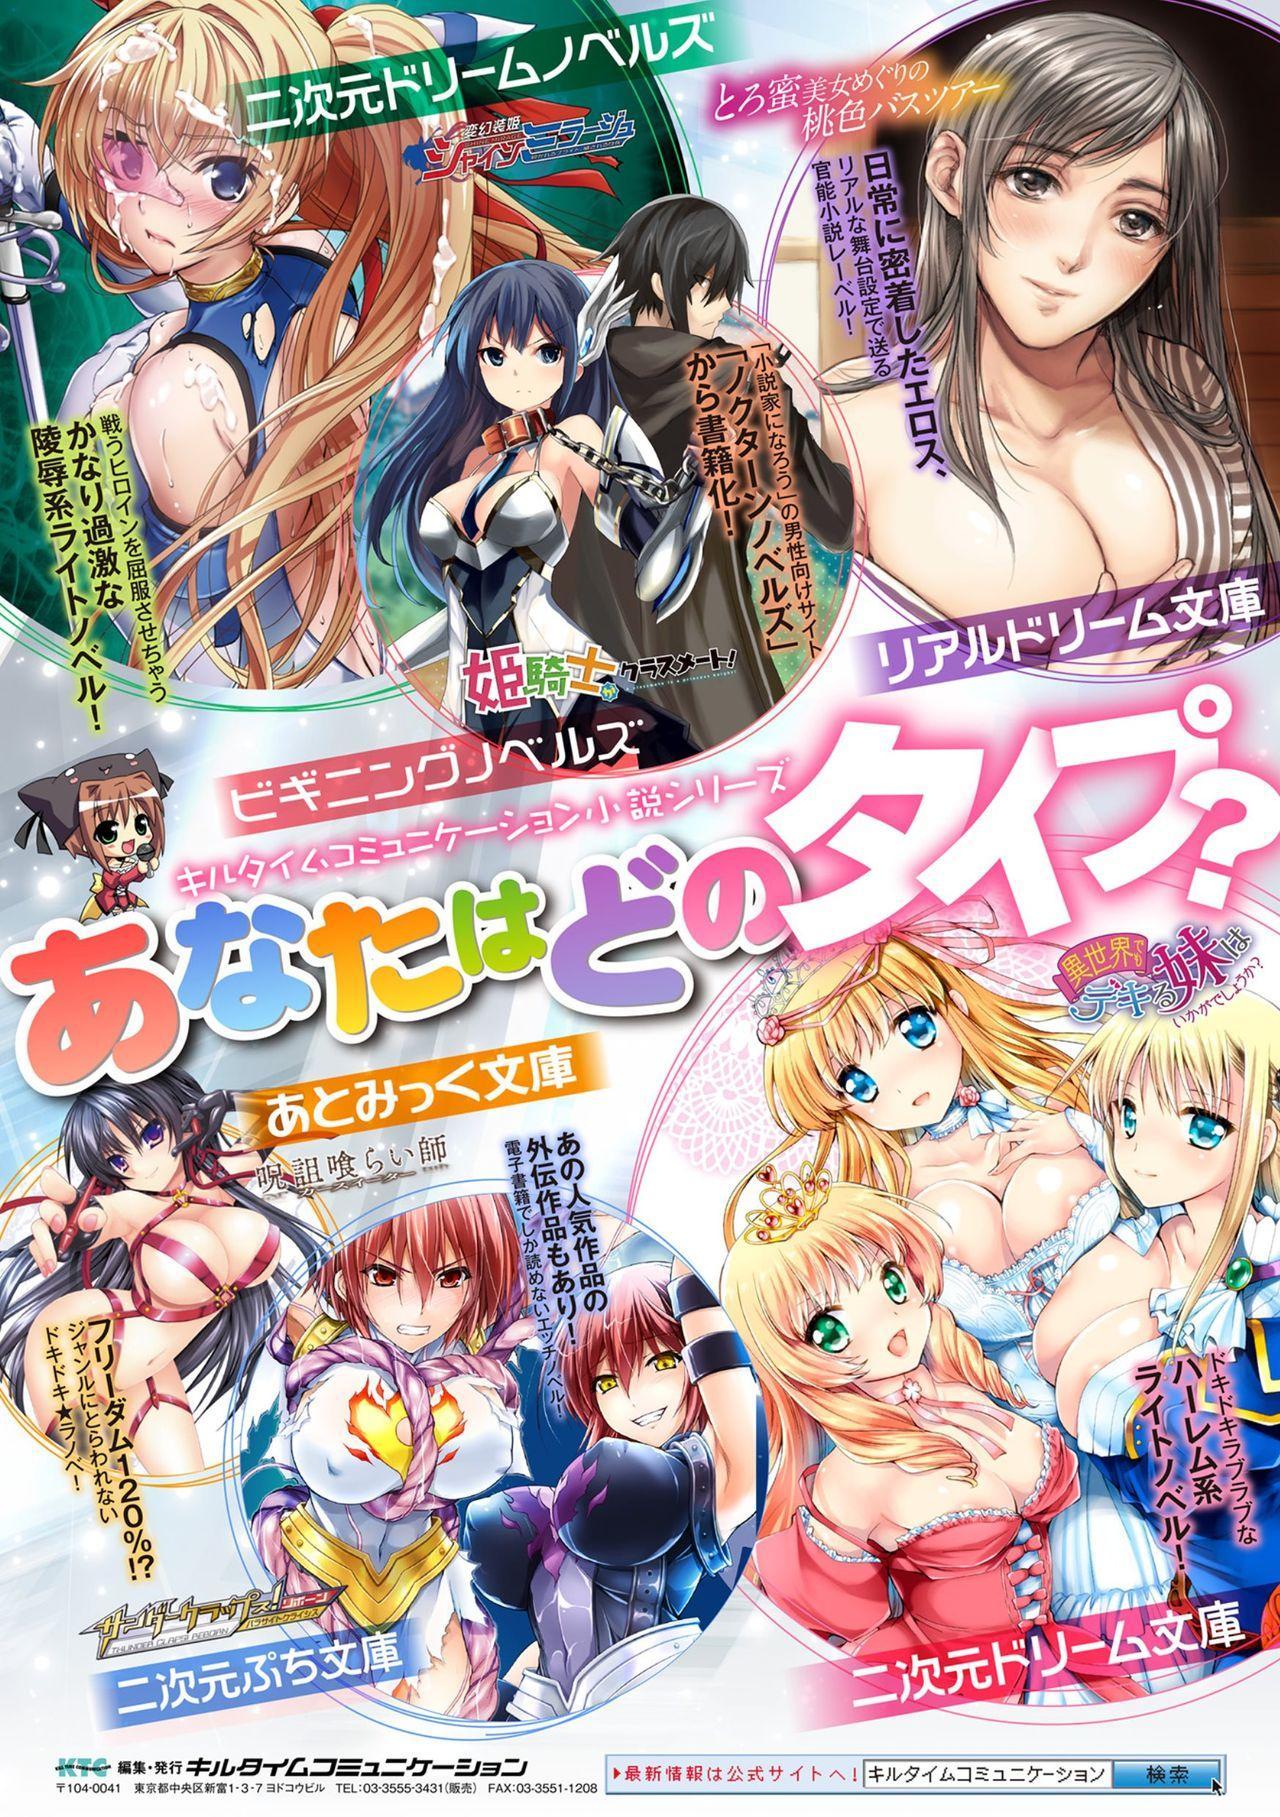 2D Comic Magazine Futanarikko no Tanetsuke Press de Kyousei Haramase! Vol. 2 81